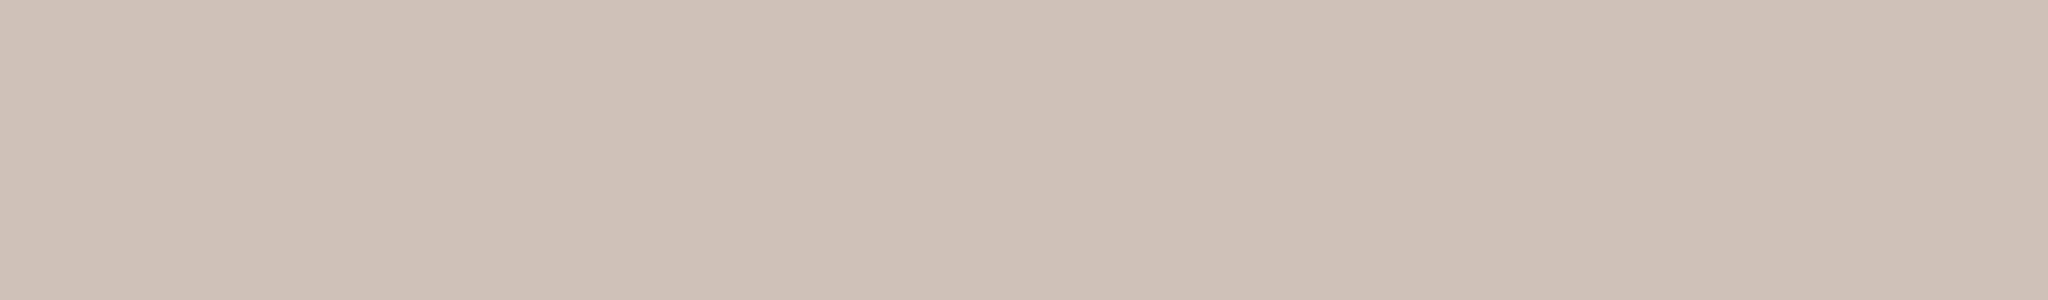 HU 120162 ABS Kante Beige glatt Supermatt